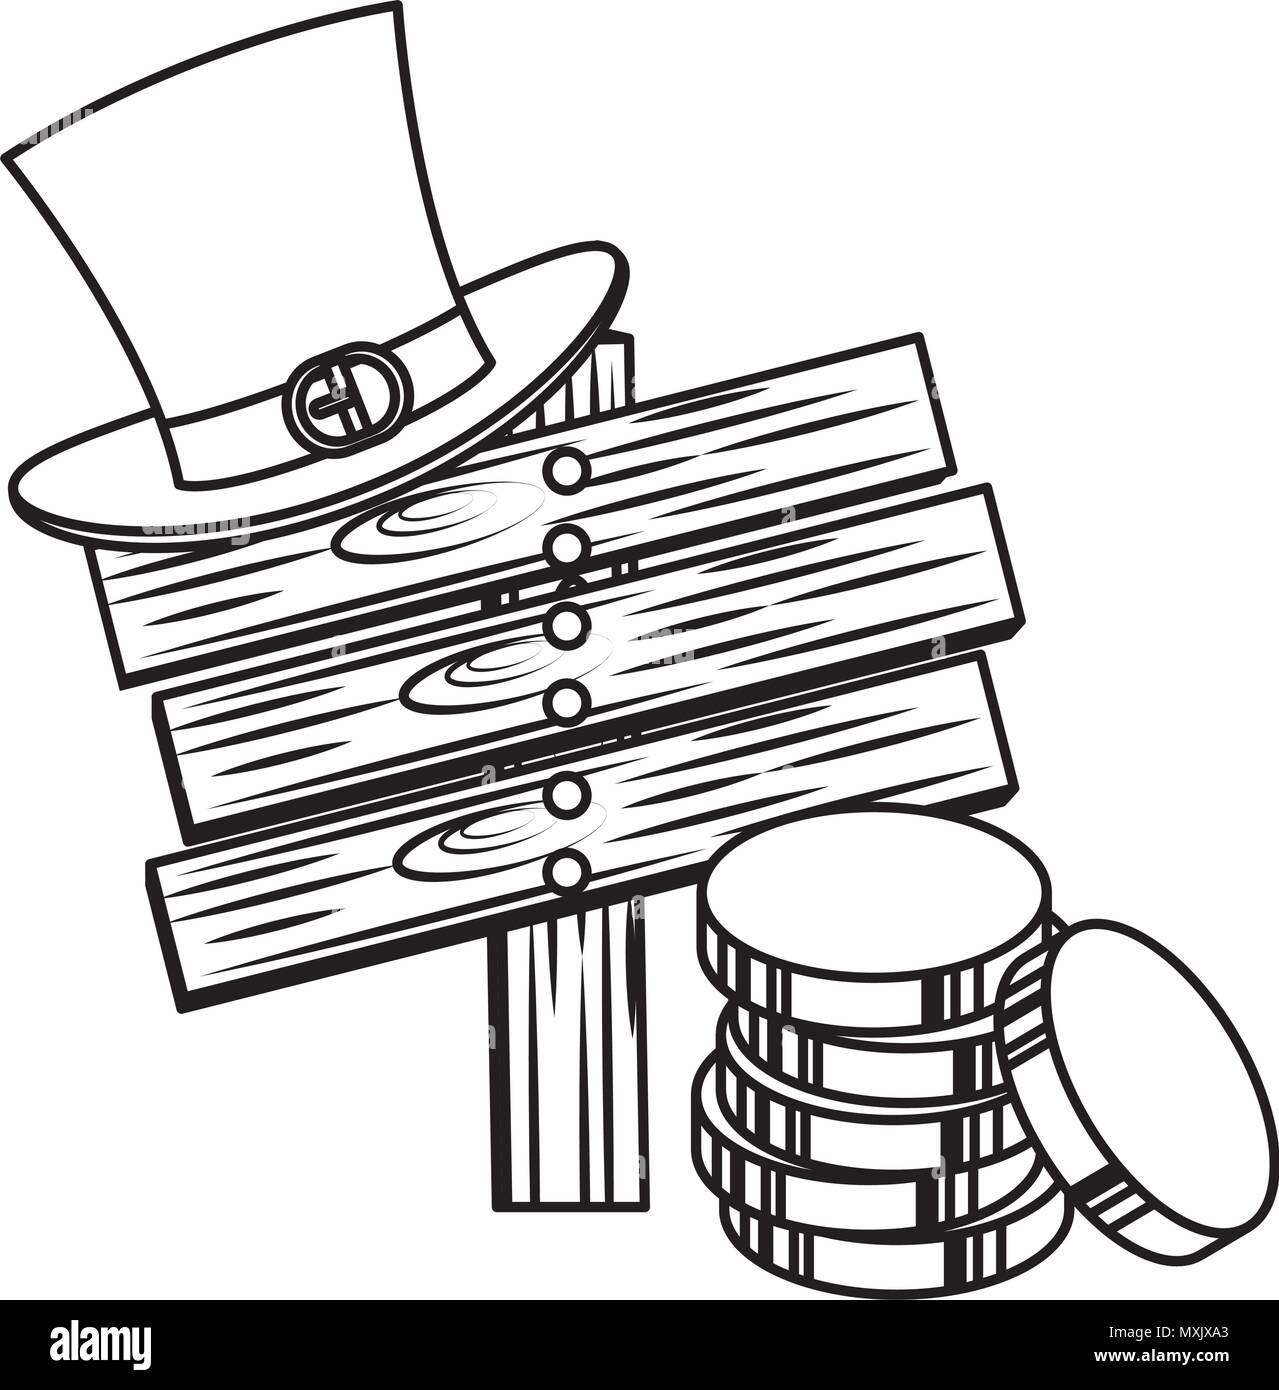 Wood Elf Stock Vector Images - Alamy